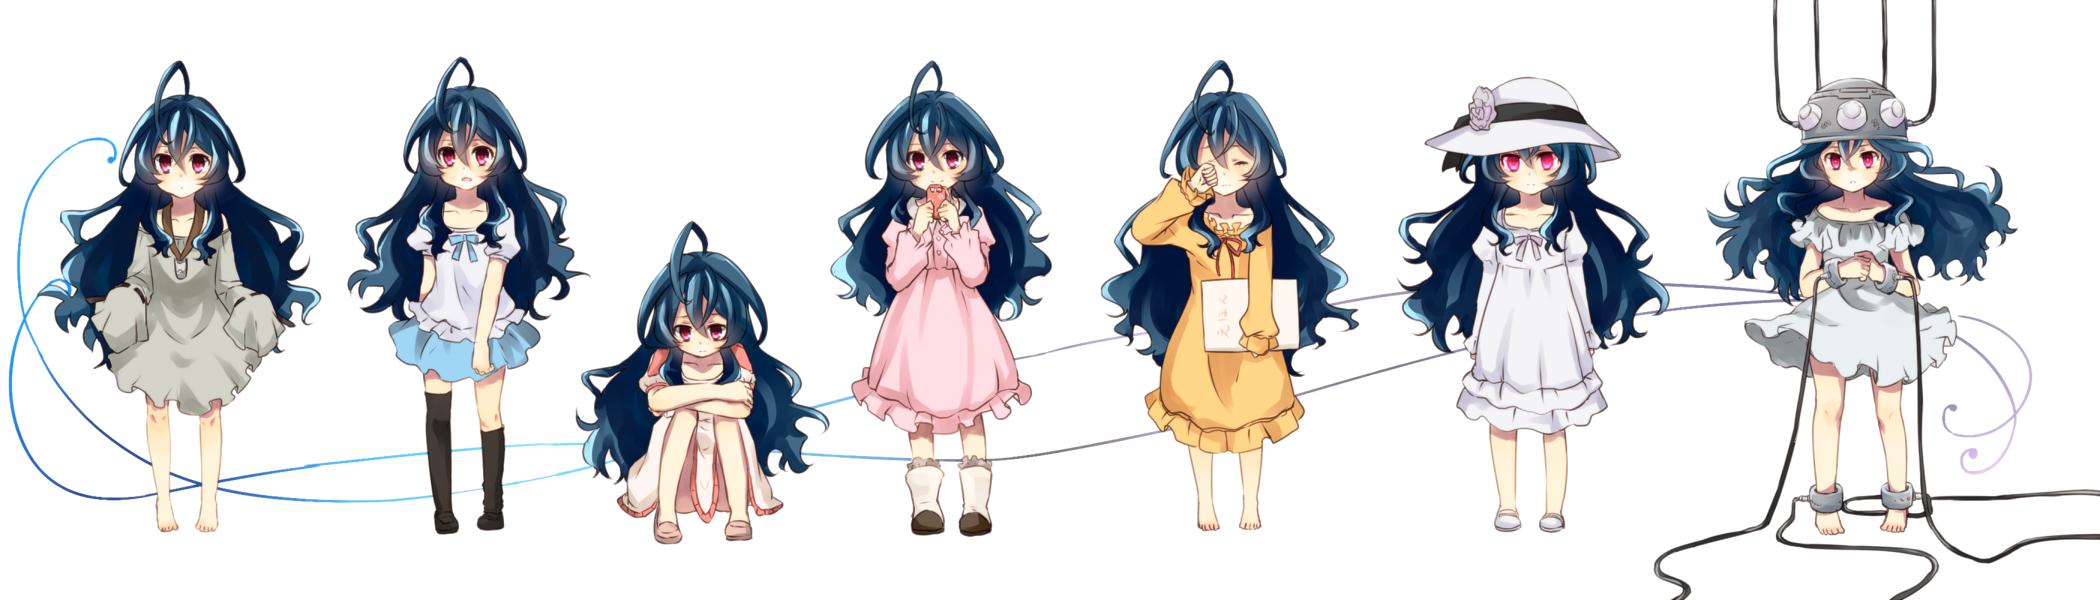 zerochan   The Unlimited  Hyoubu Kyousuke   Yugiri   1468651Zettai Karen Children The Unlimited Yugiri